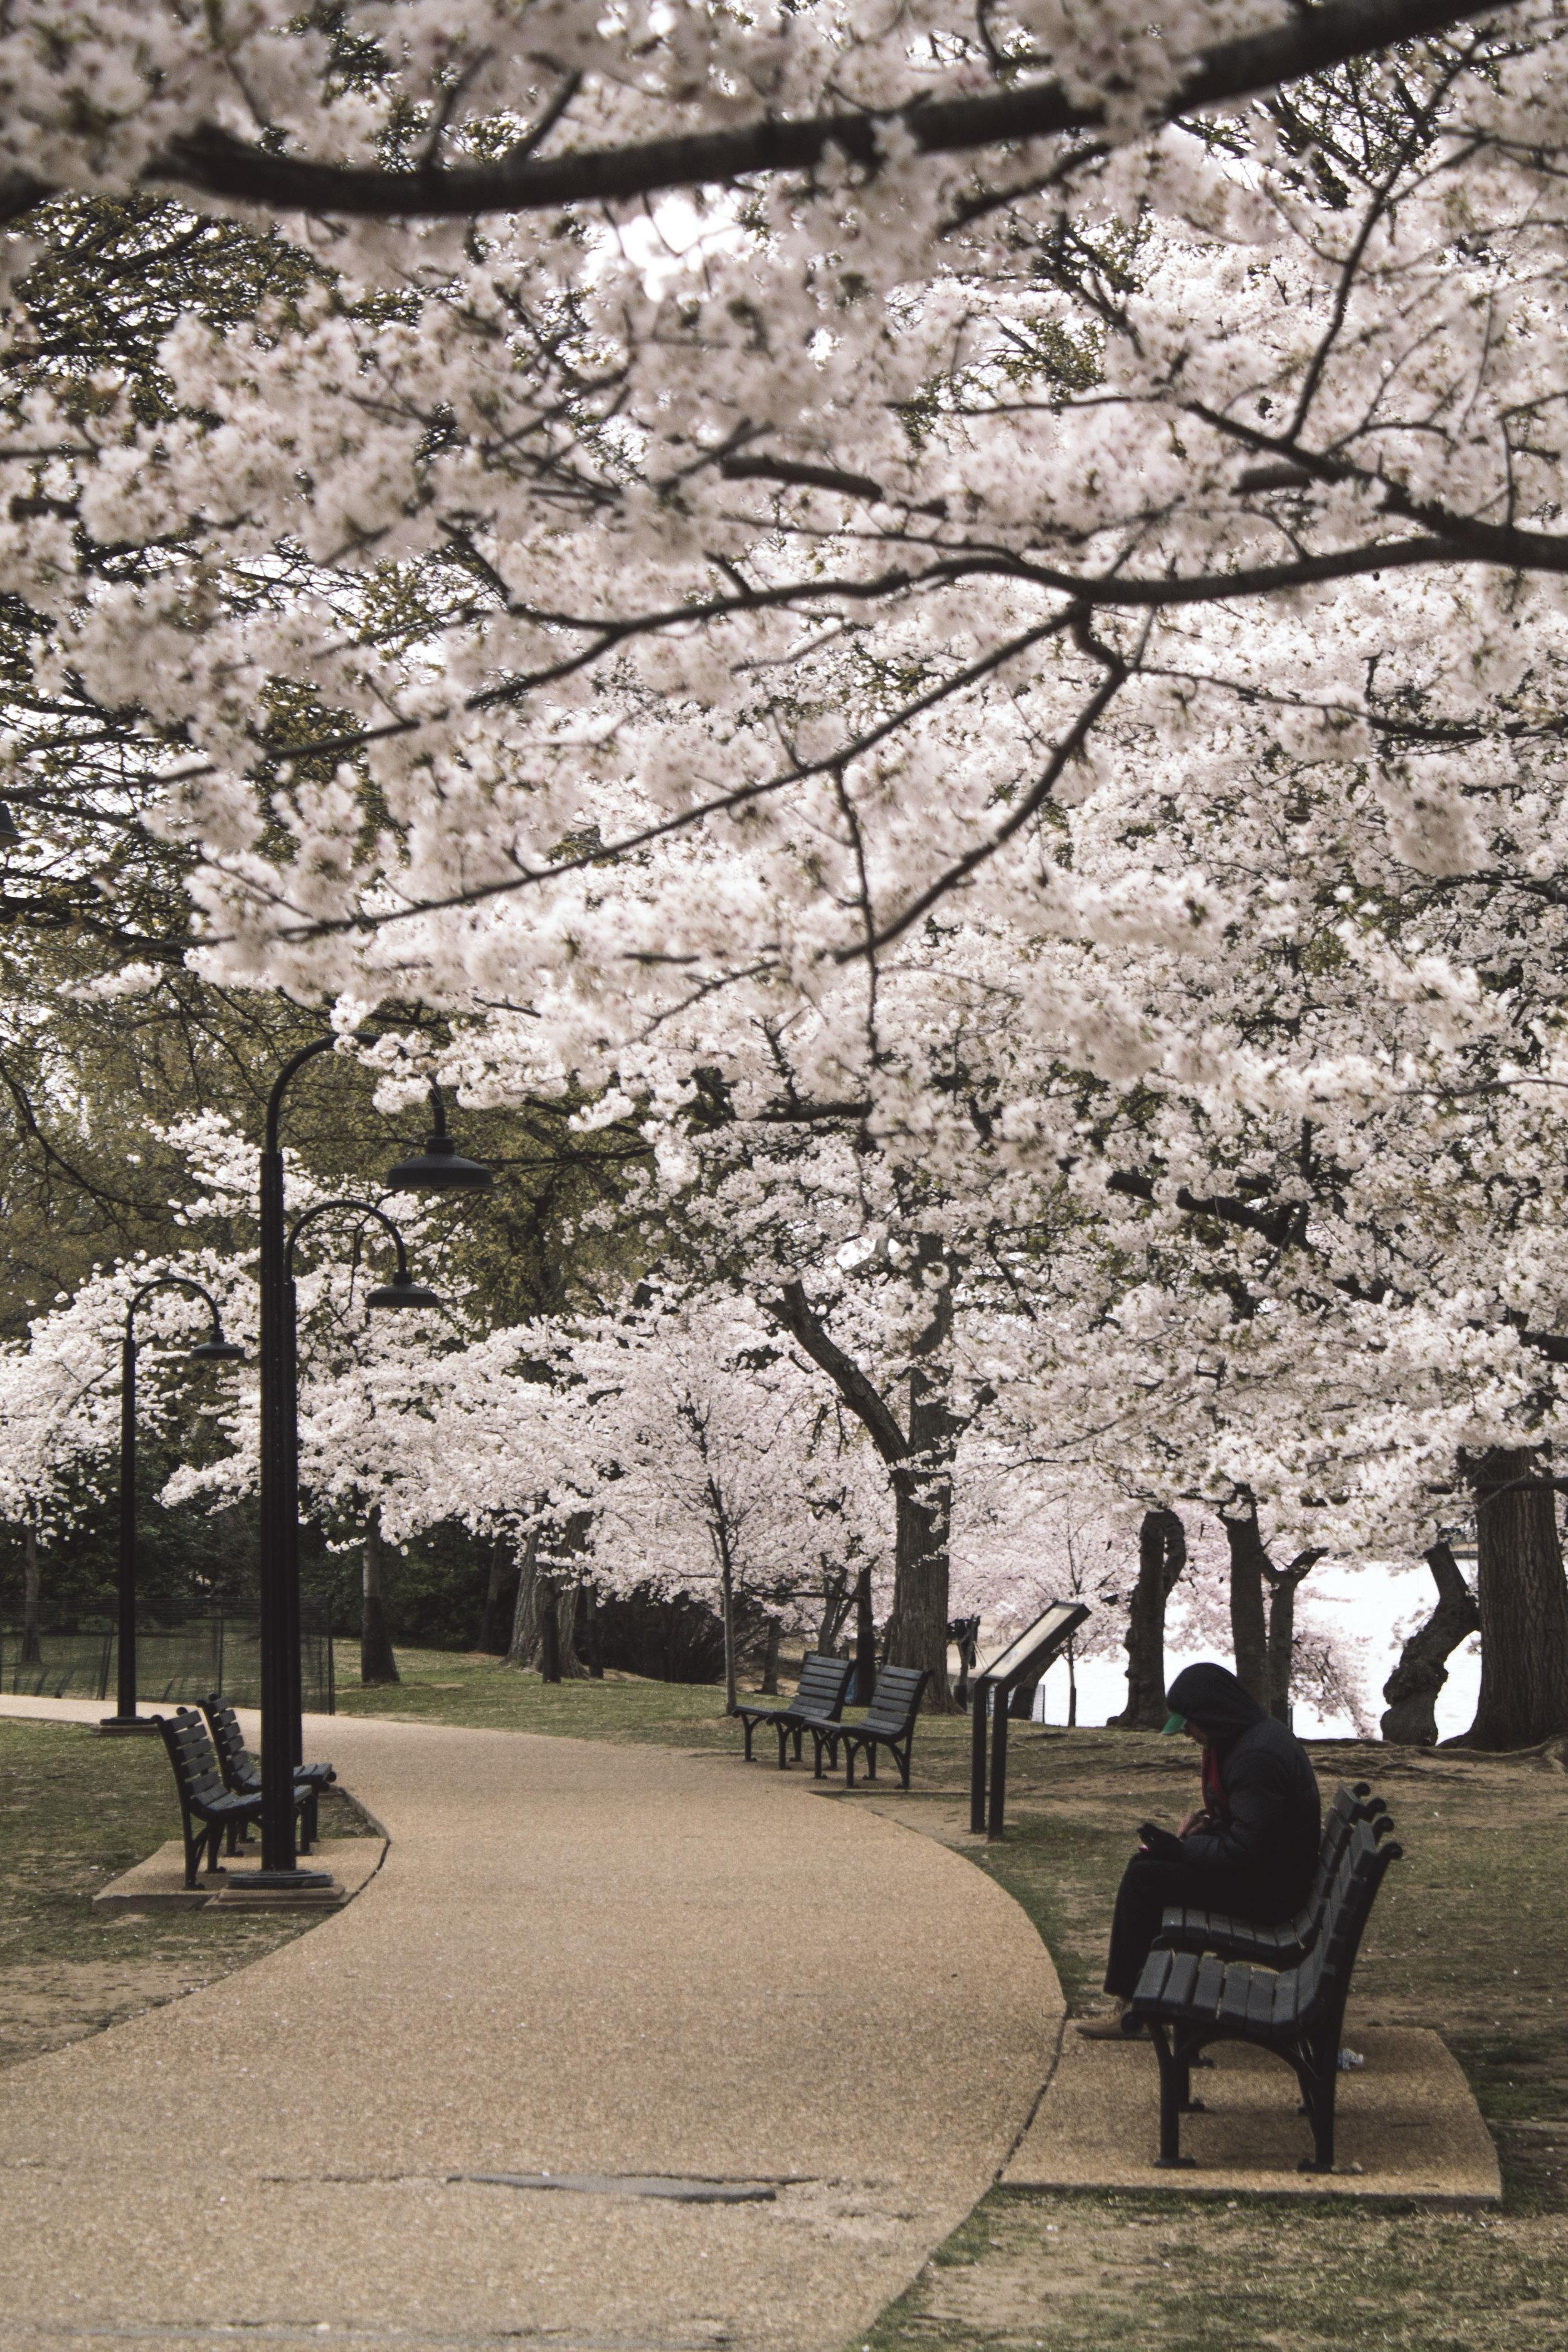 Cherry blossoms along DC's Tidal Basin